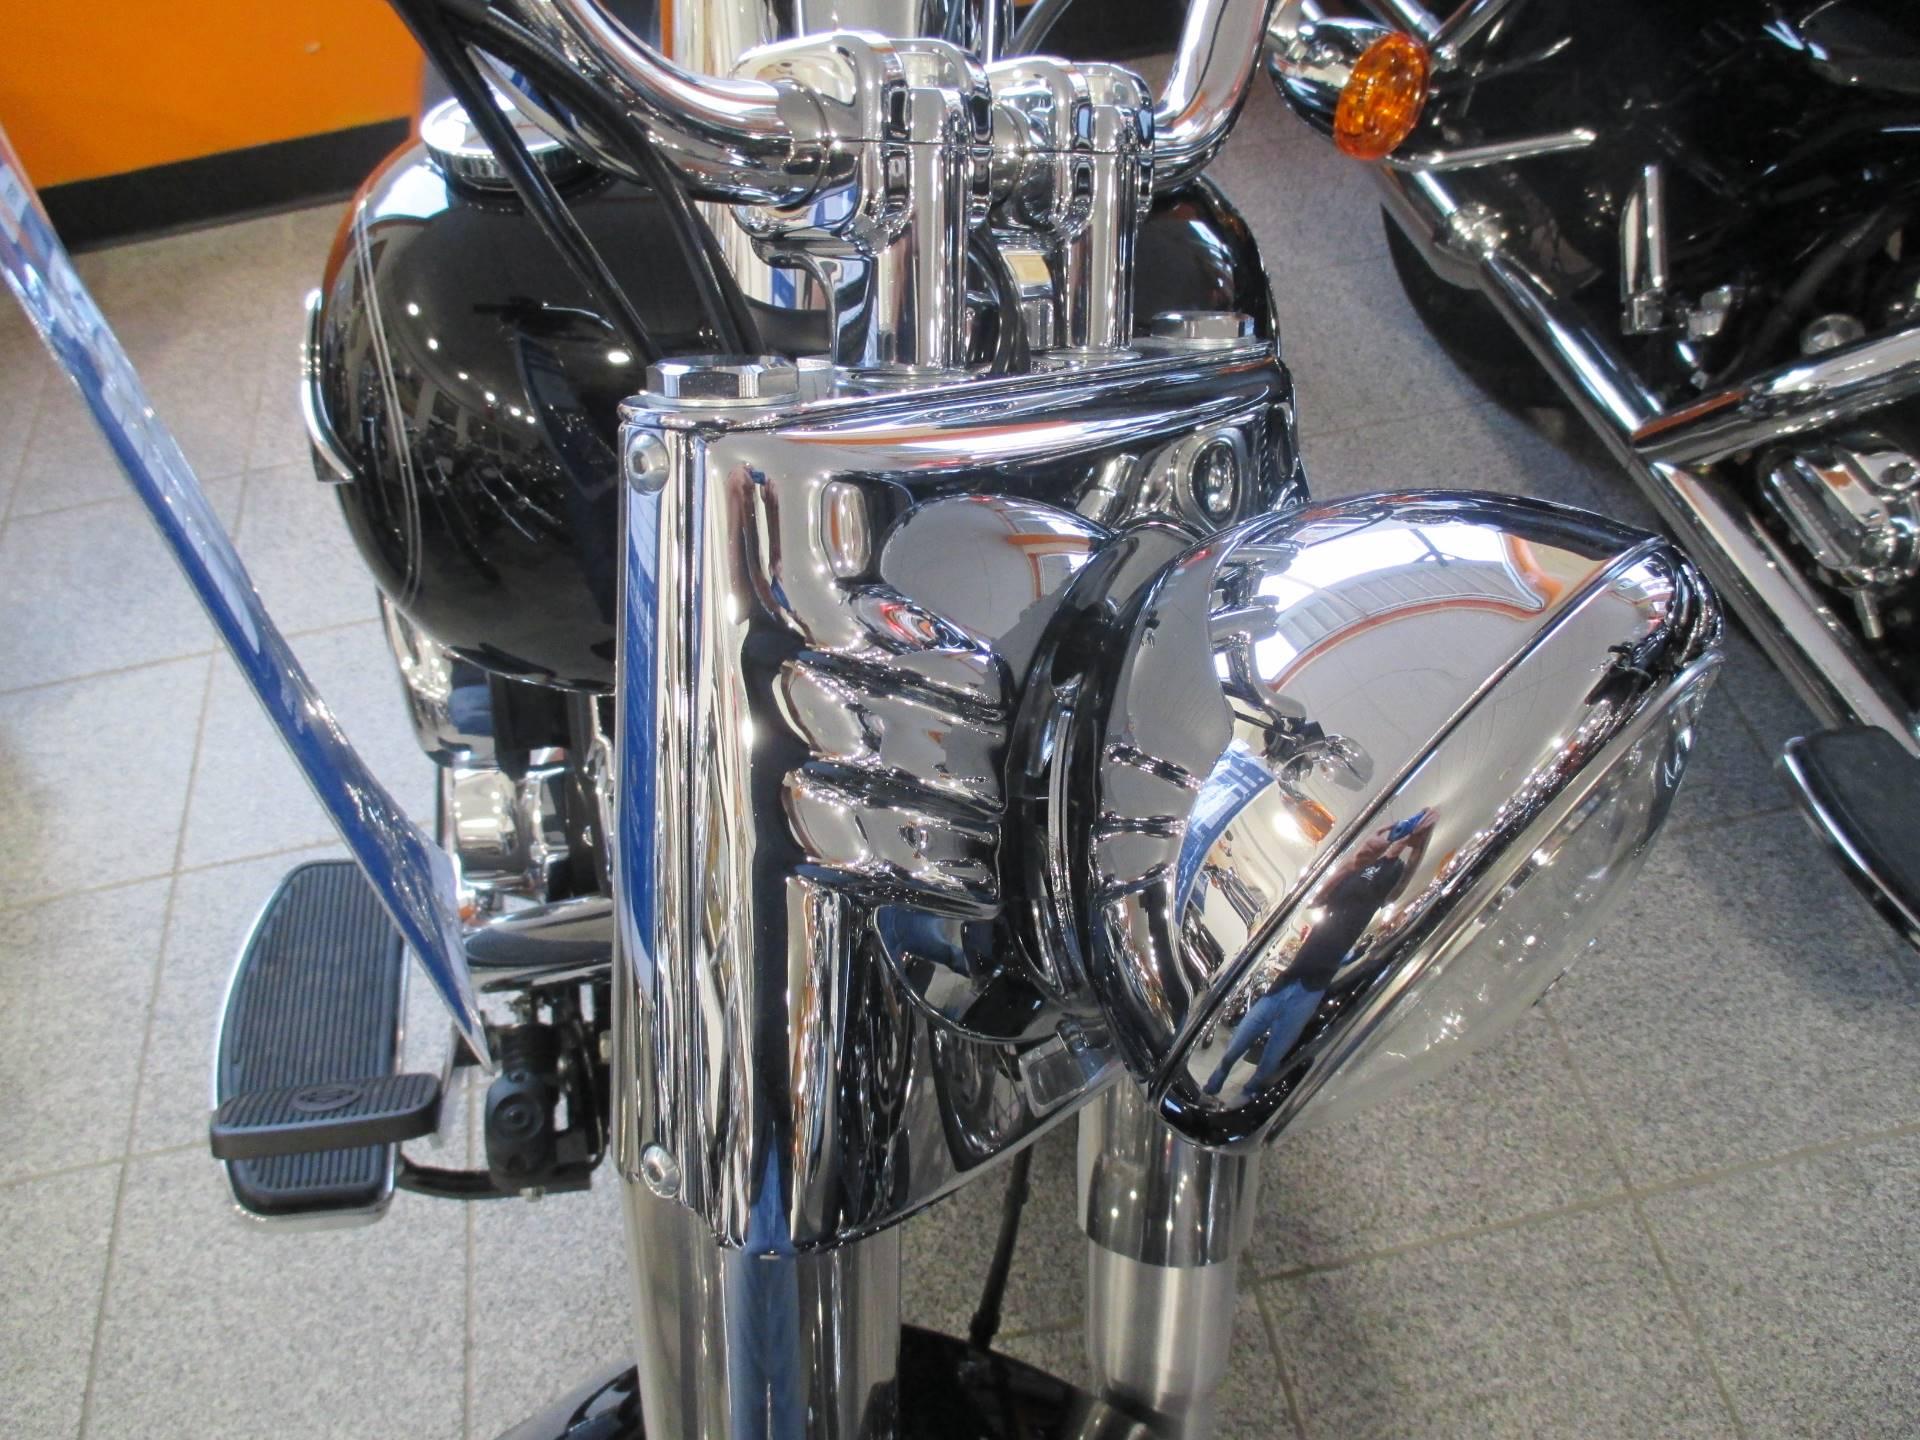 used harley davidson fat boy reg motorcycles in stroudsburg pa 2015 harley davidson fat boyreg in stroudsburg pennsylvania